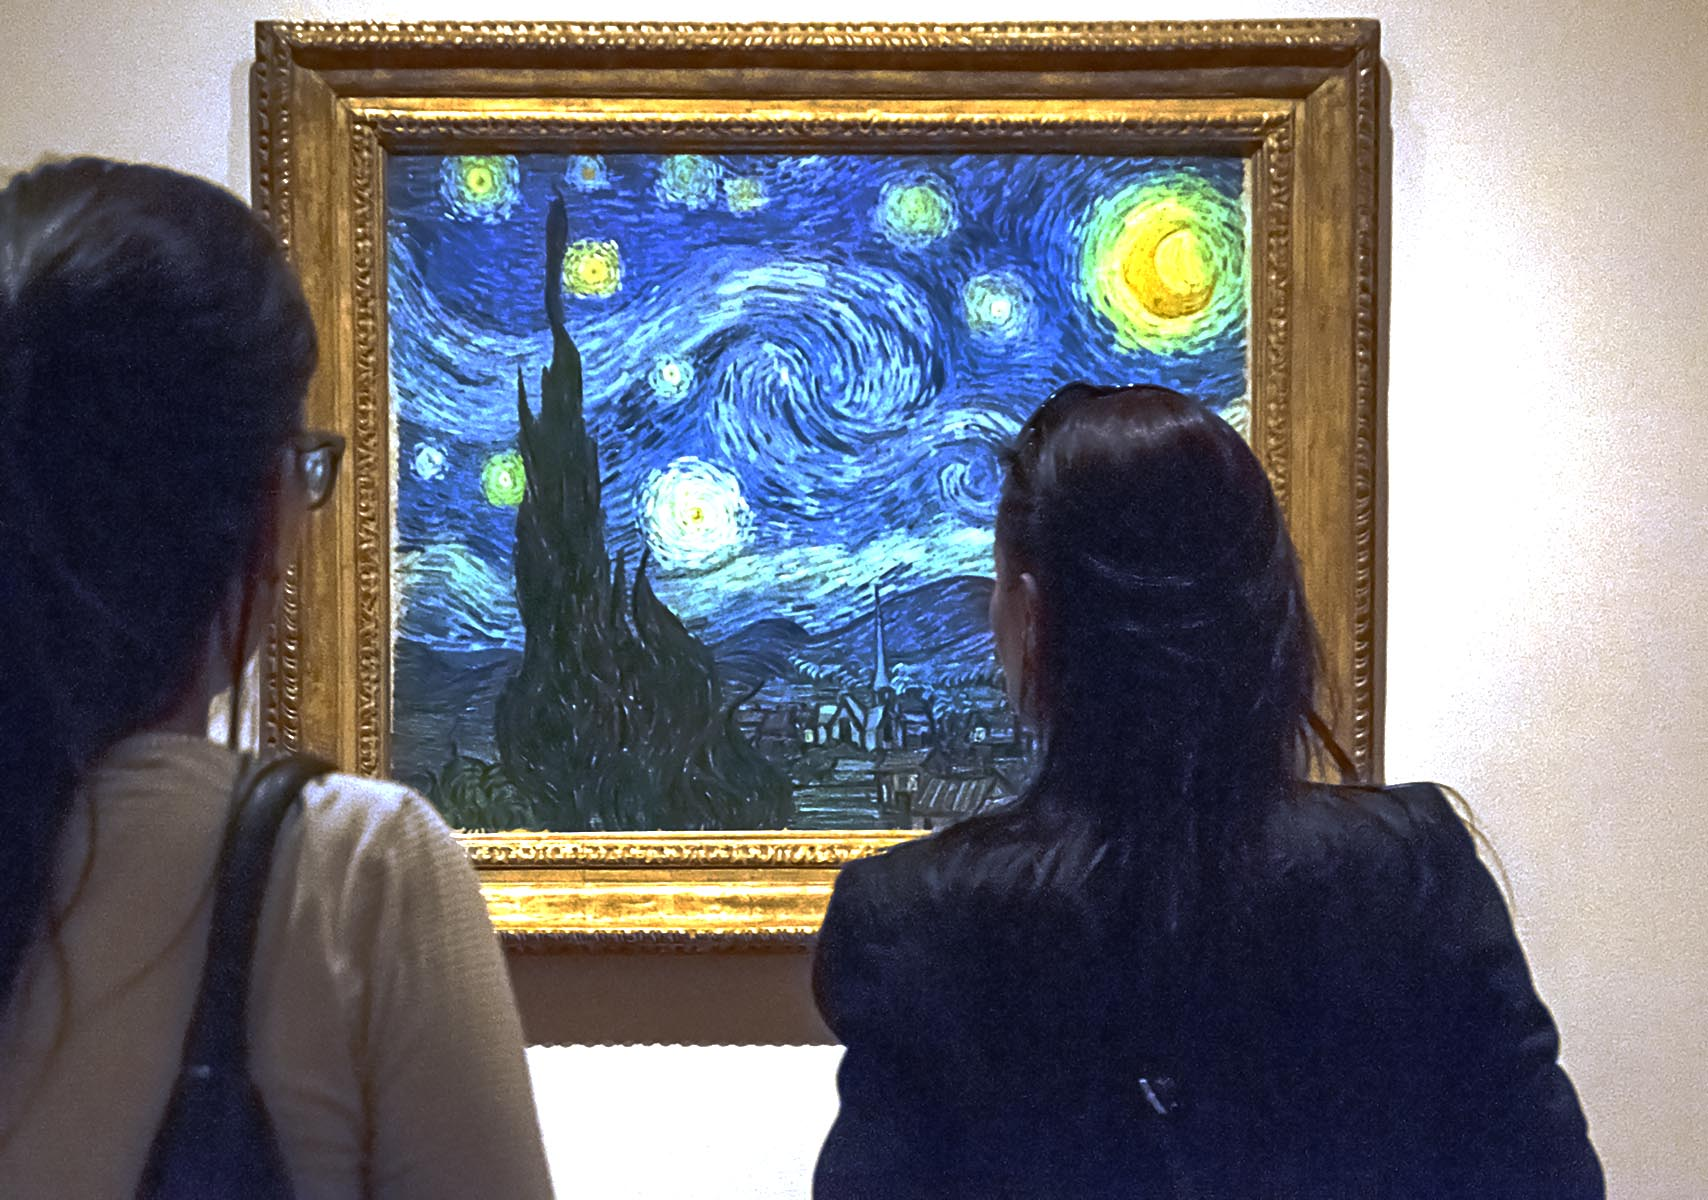 Starry Starry Night - 497